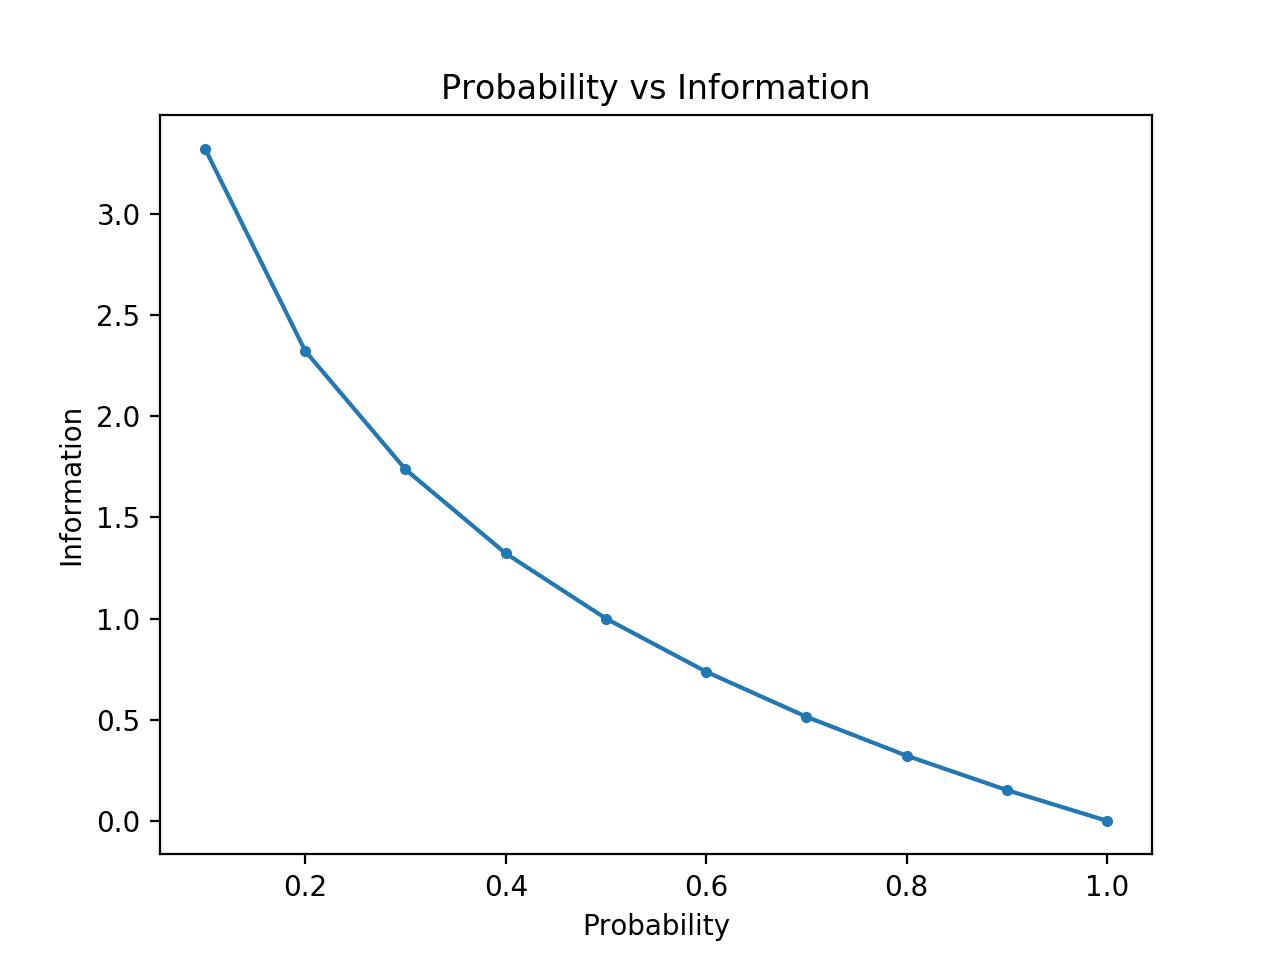 Plot of Probability vs Information